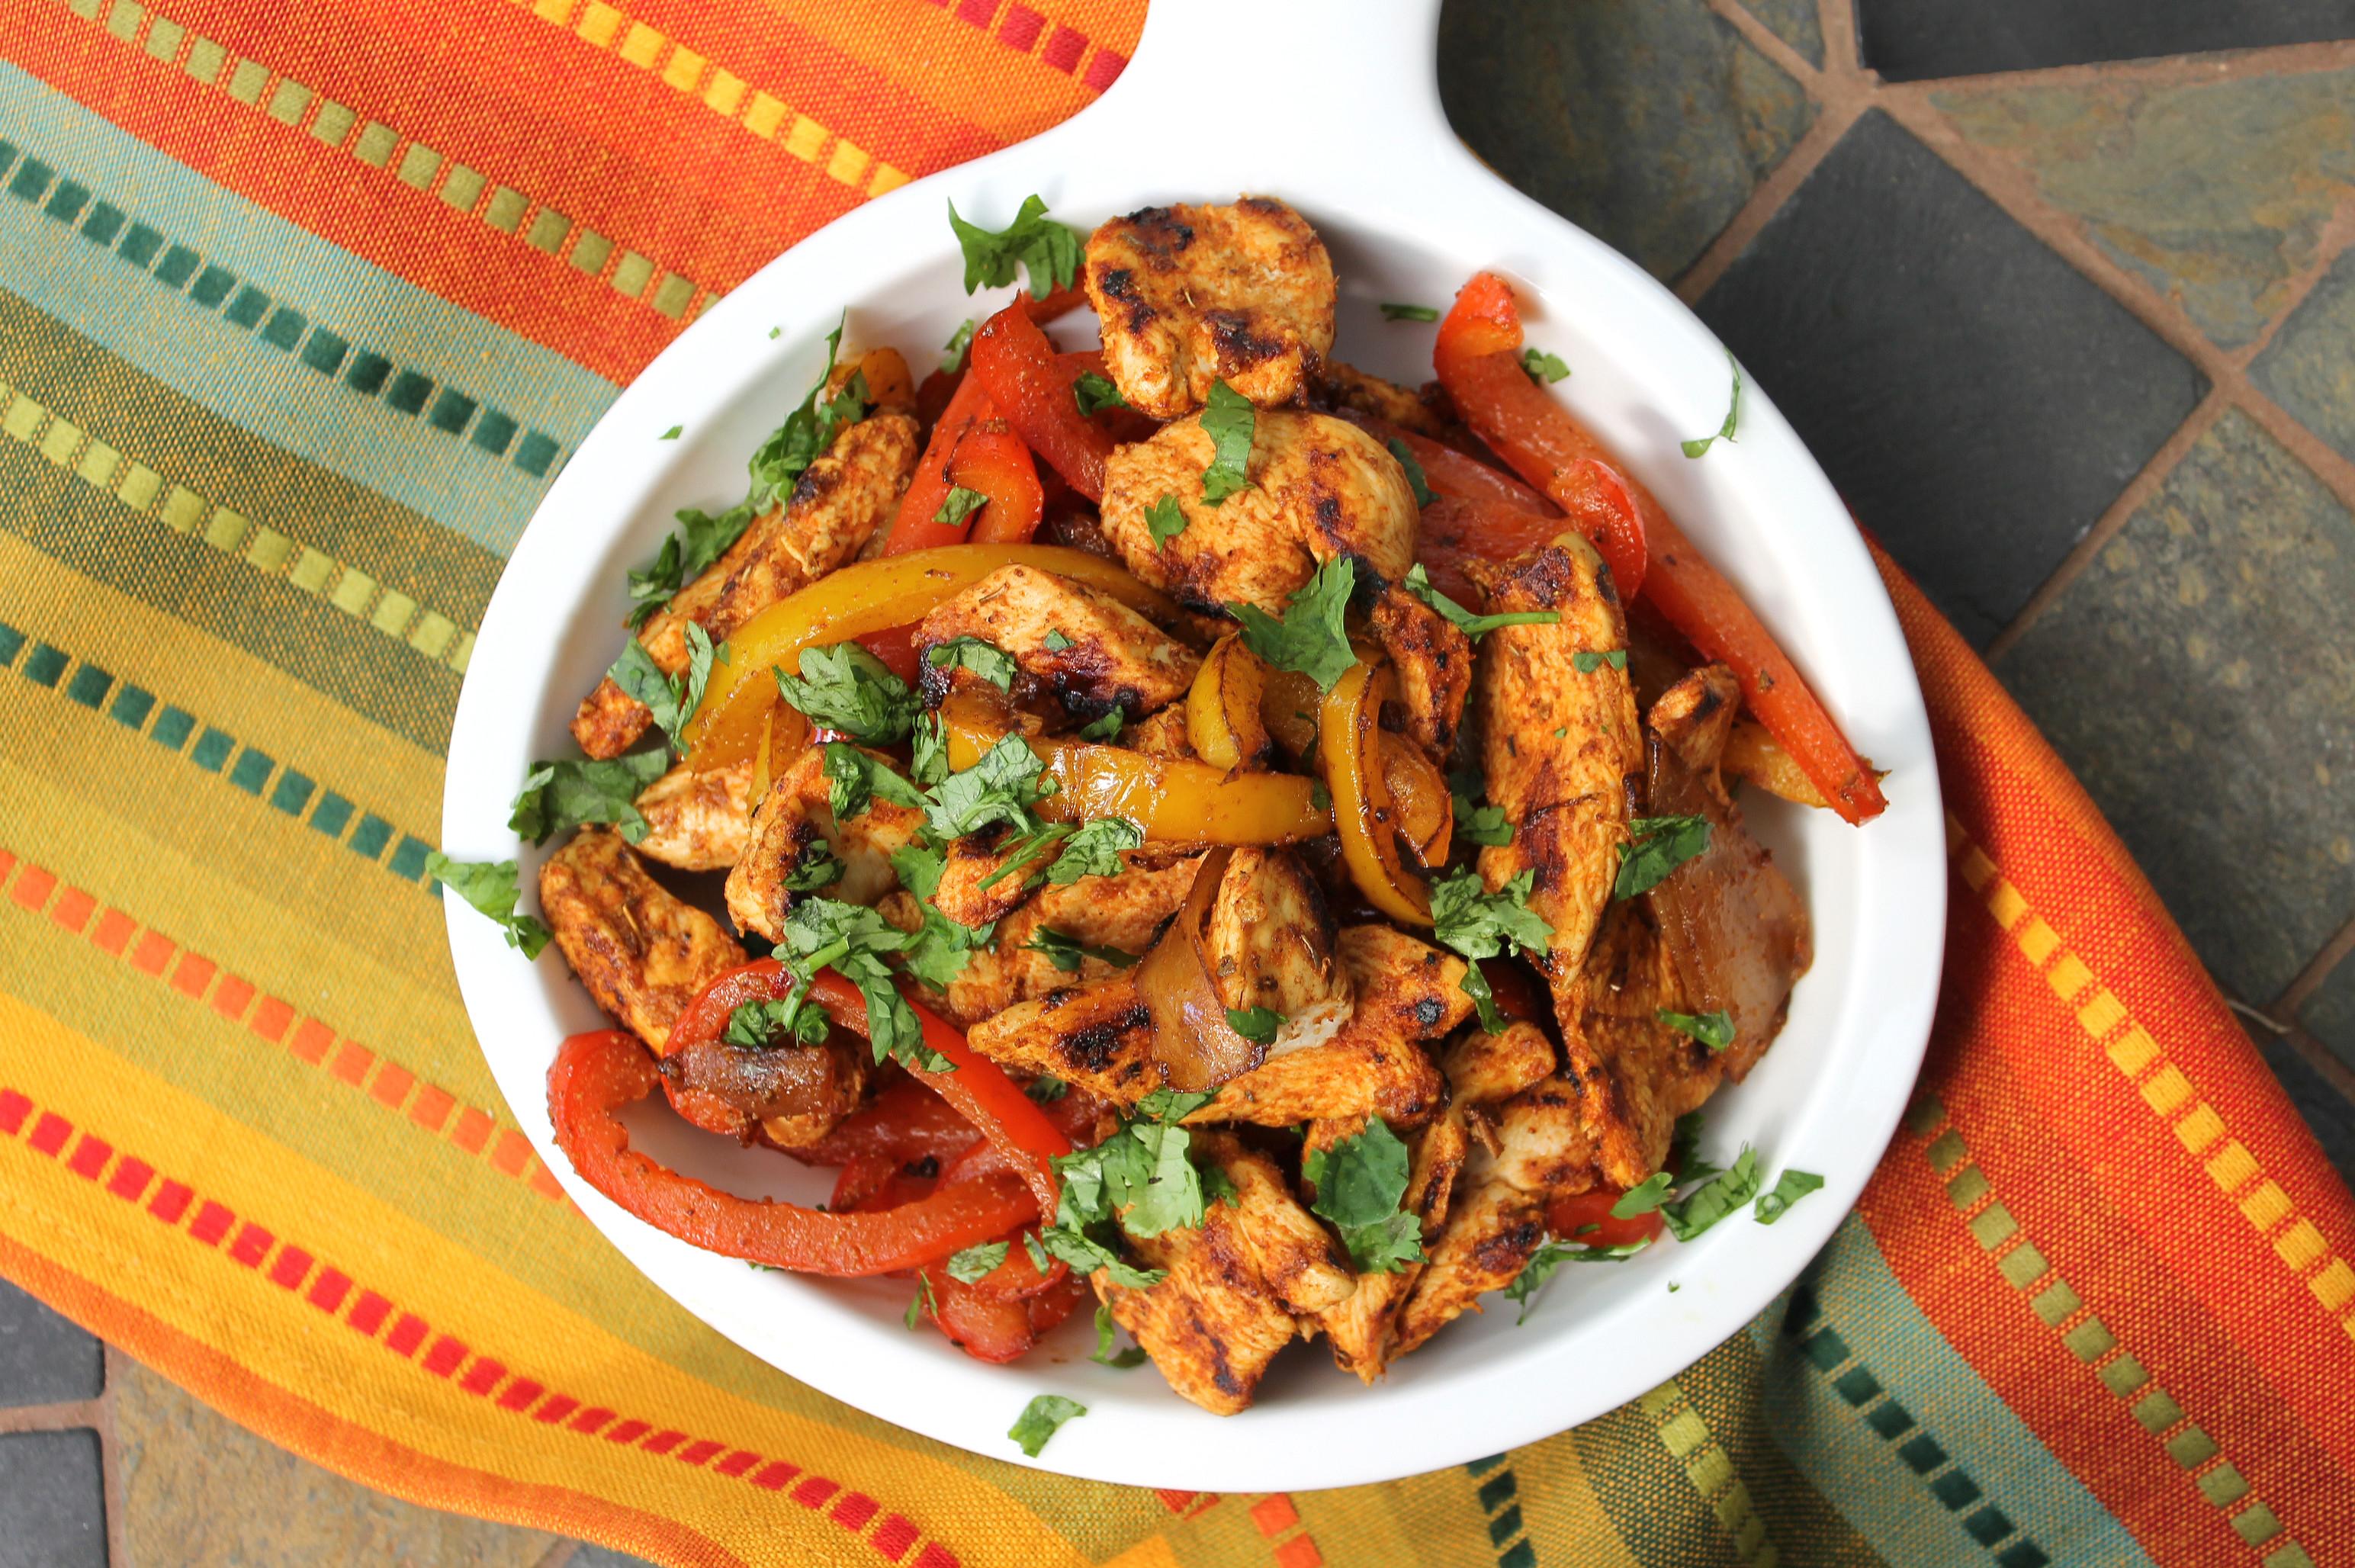 Low Fat Chicken Fajitas  40 Healthy Chicken Recipes For The Entire Family